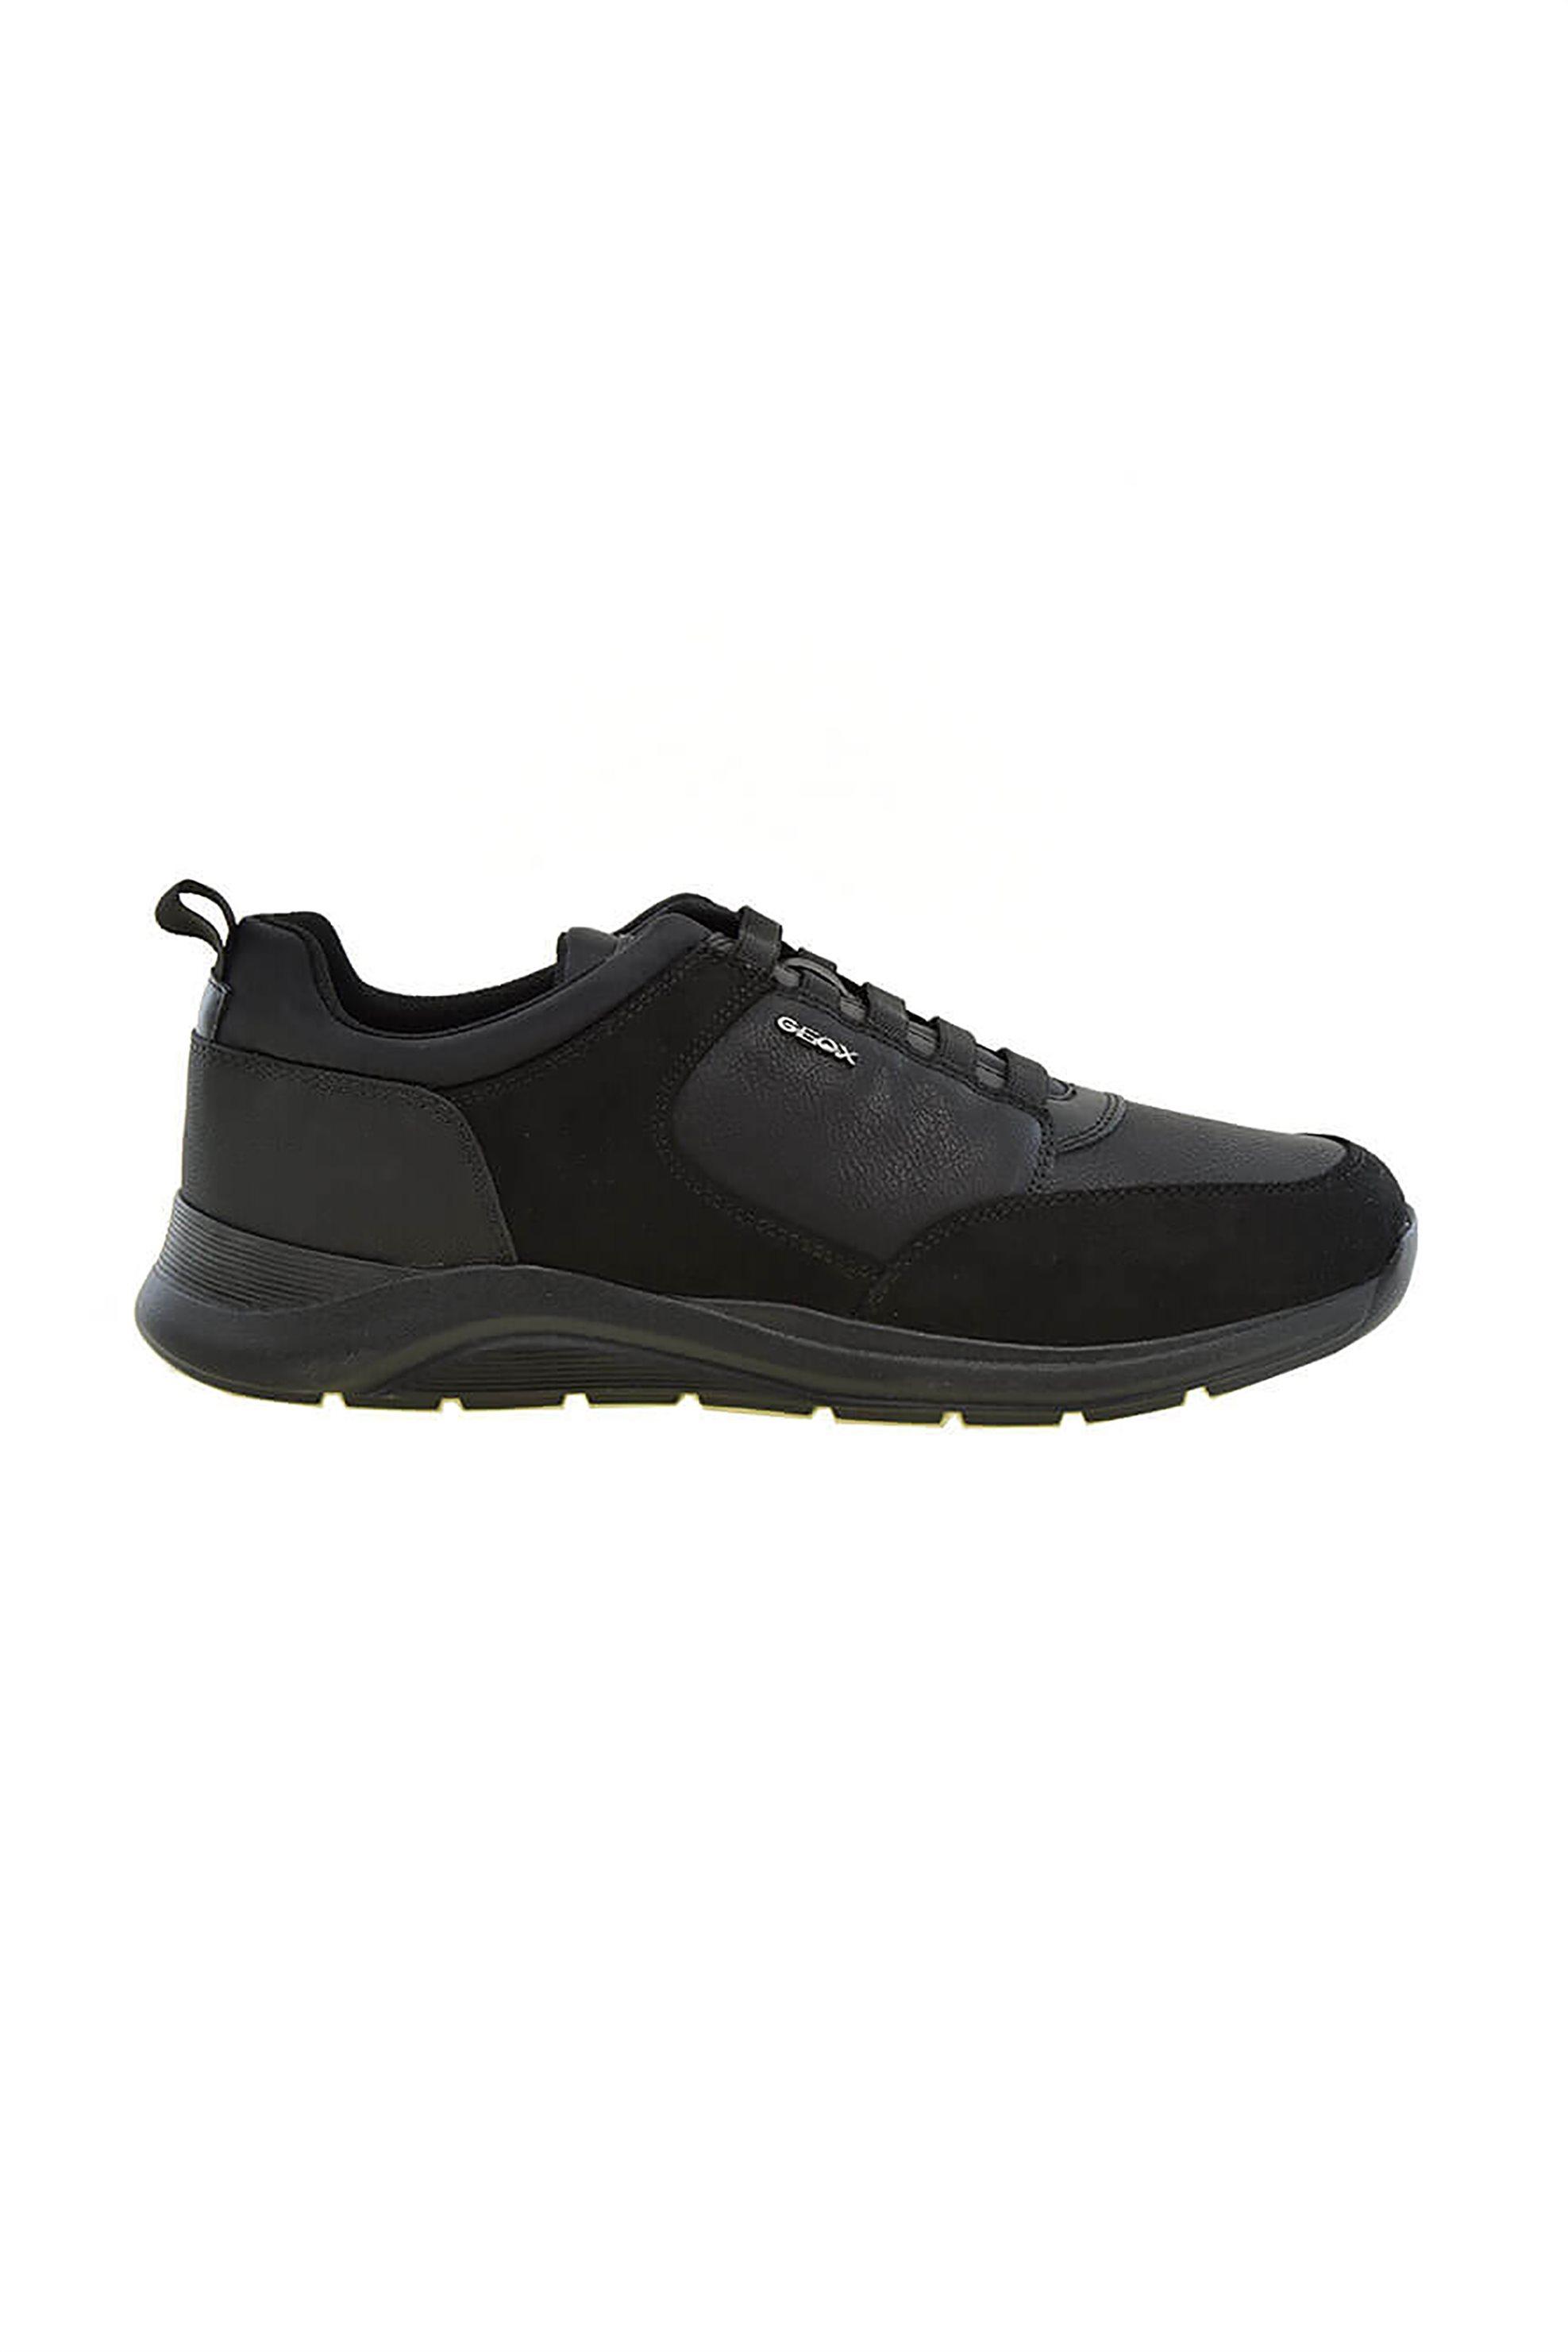 "Geox ανδρικά sneakers με suede λετομέρειες ""Damiano"" – U04AND – Μαύρο"